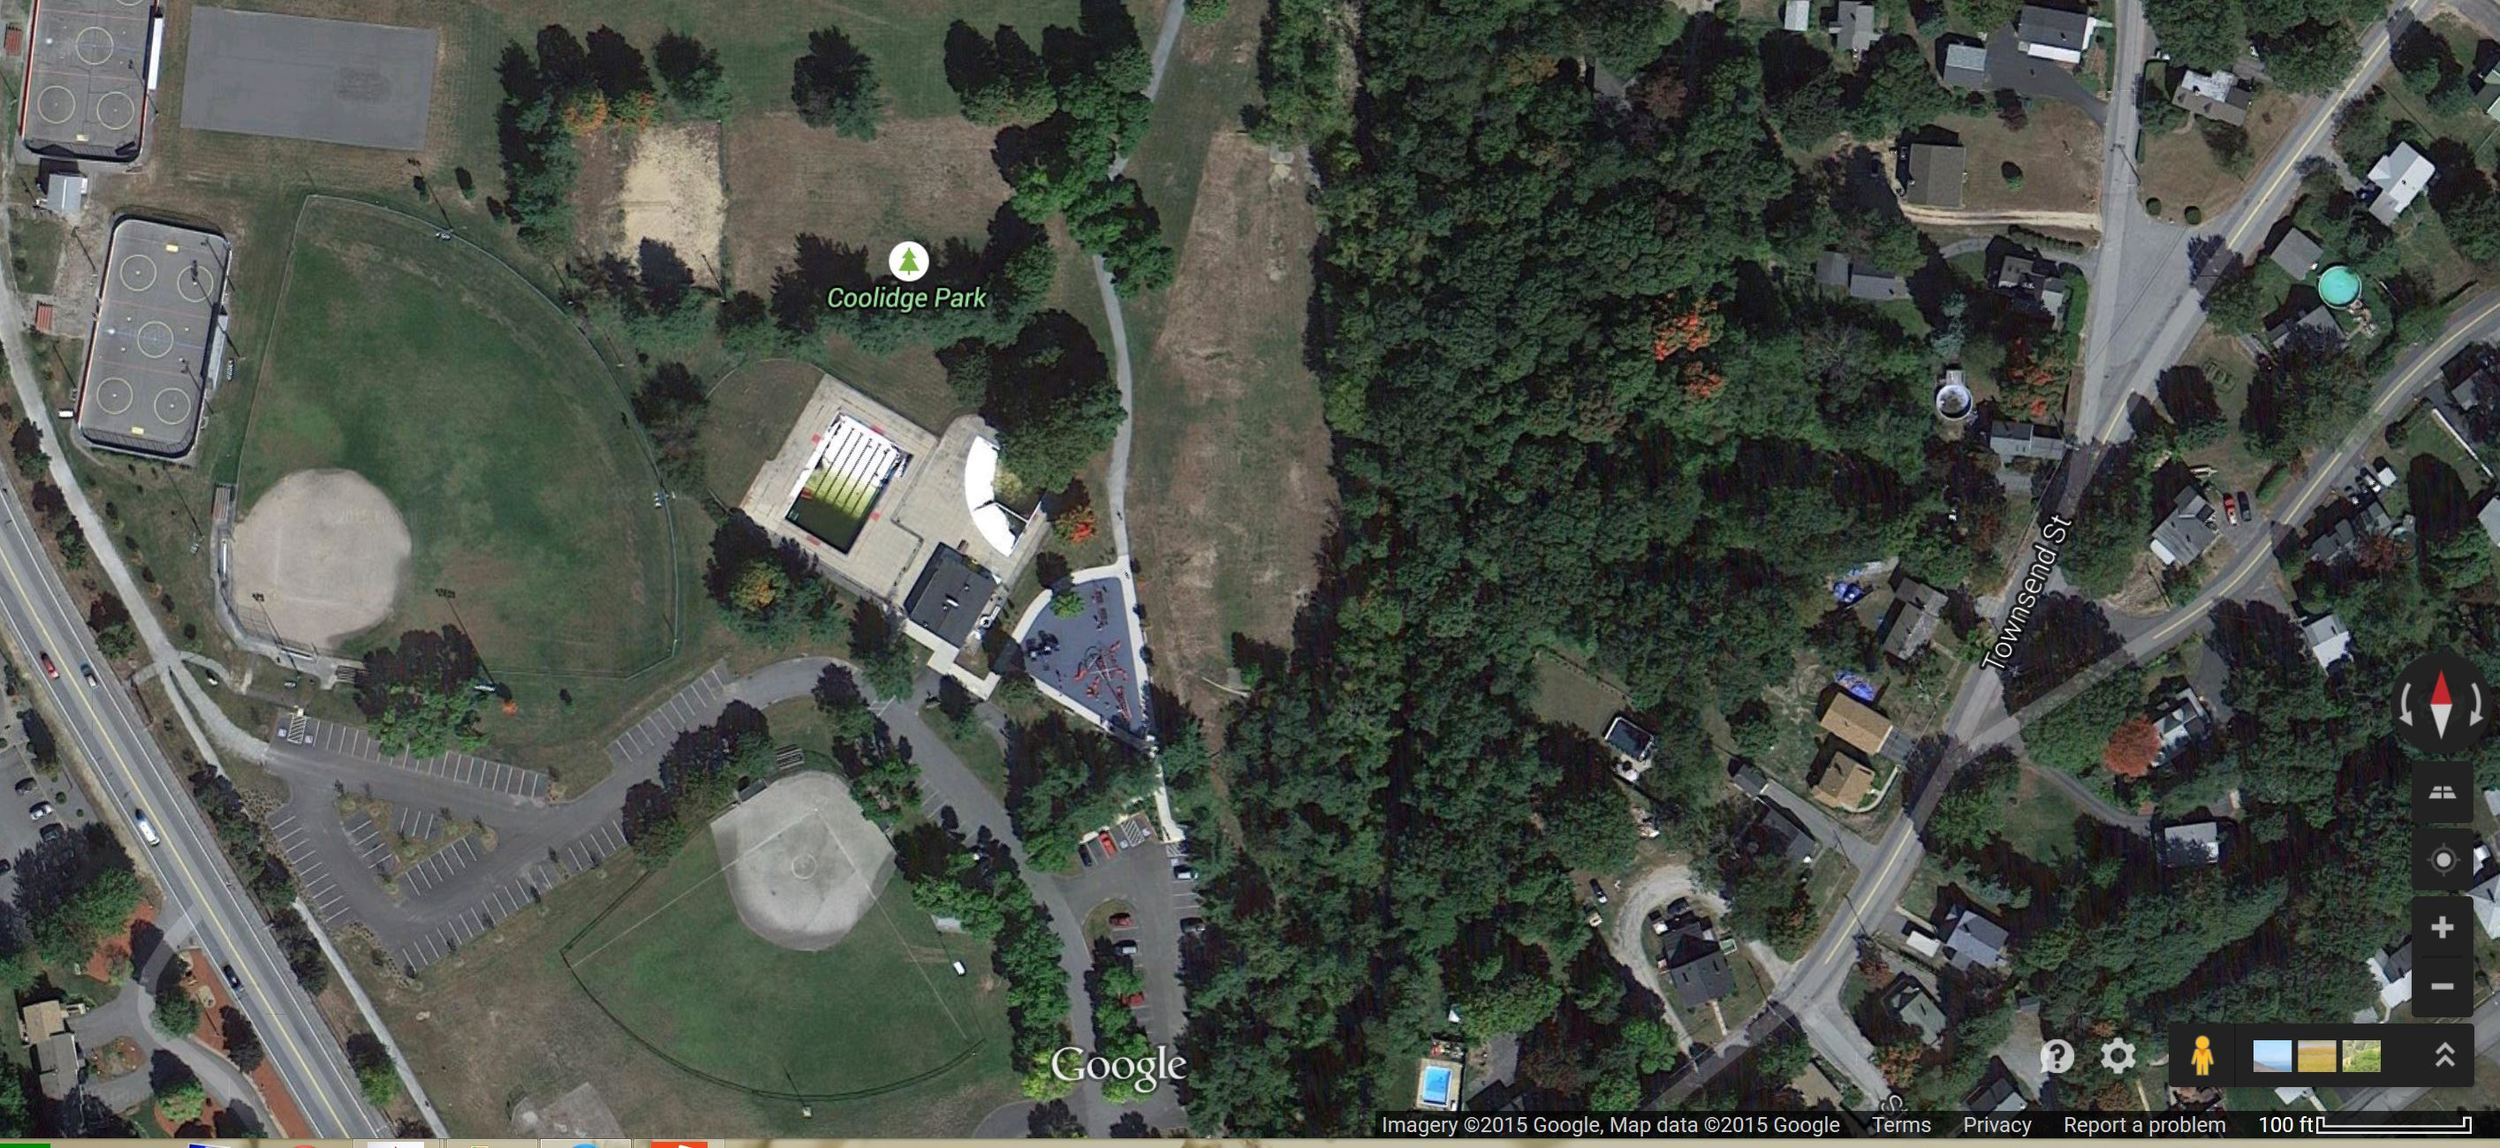 coolidge park google earth 5-16-15.JPG